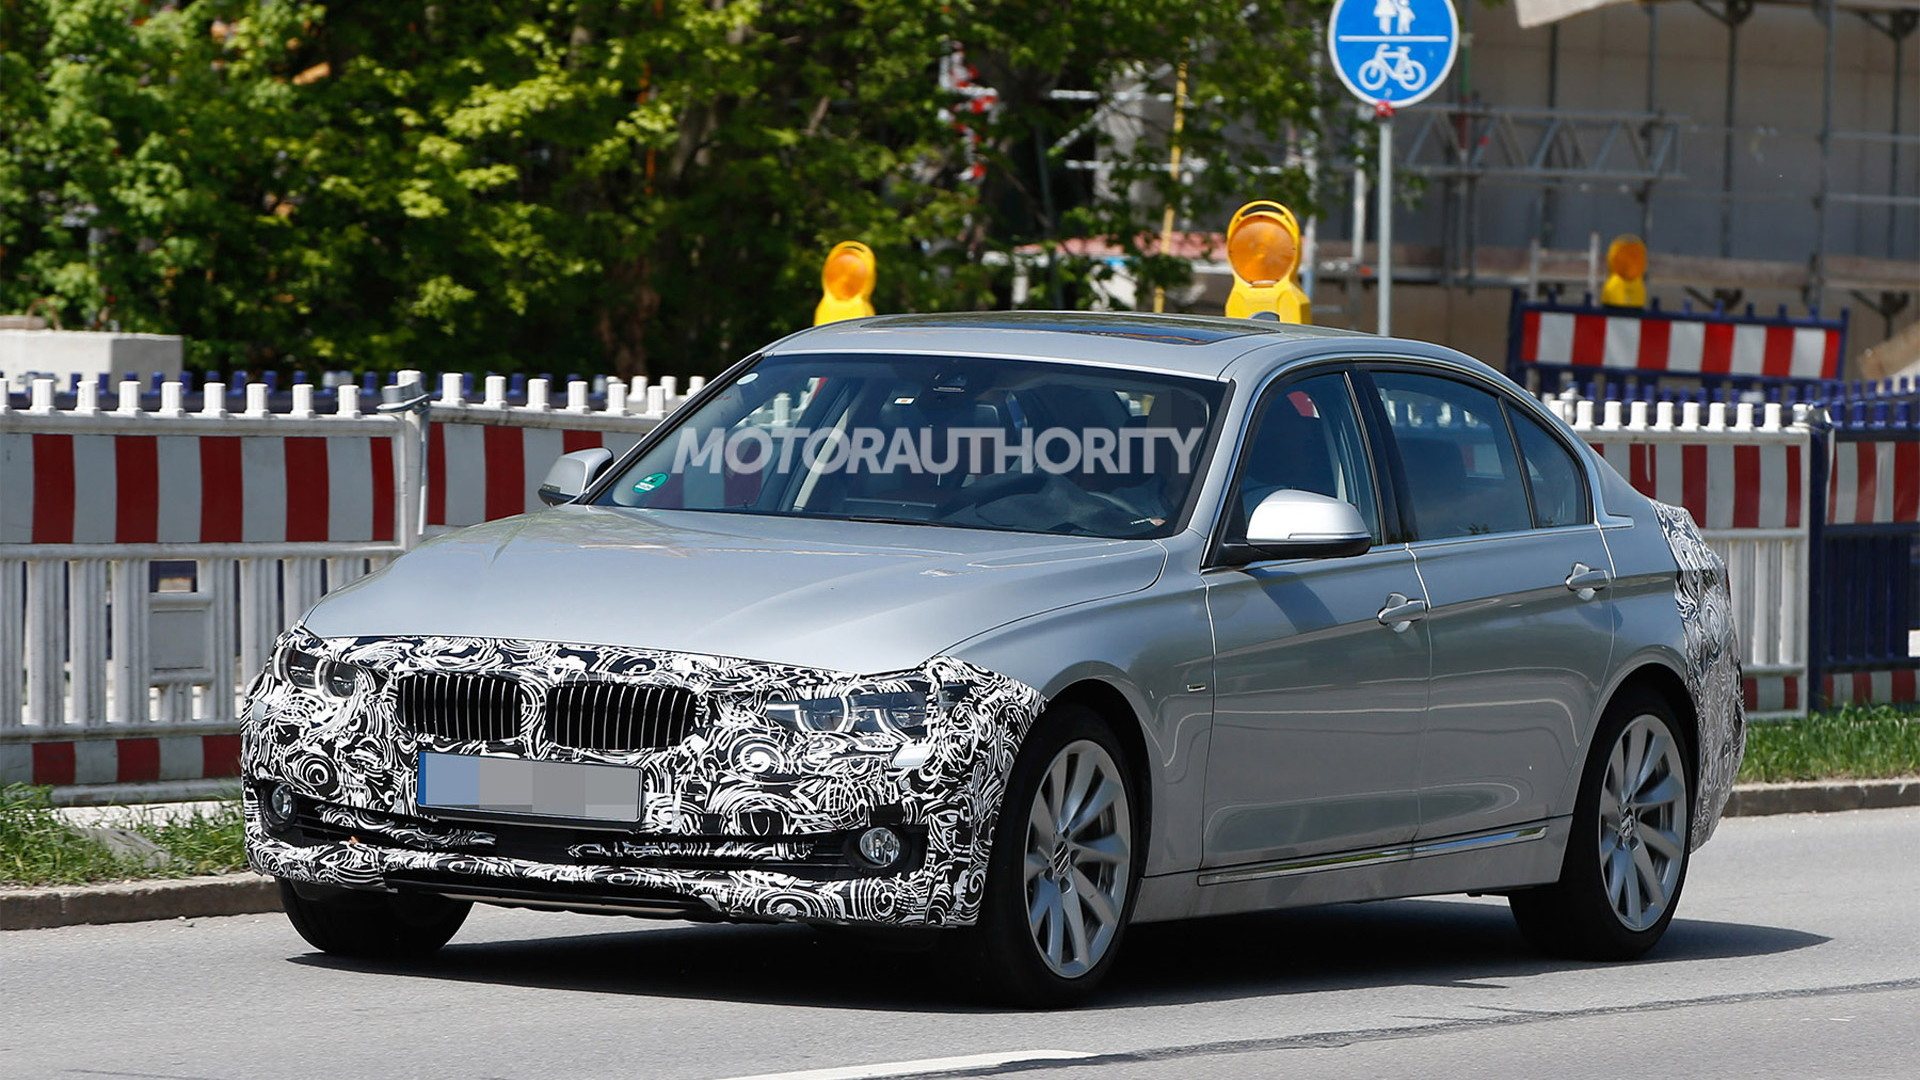 2016 BMW 3-Series long-wheelbase model facelift spy shots - Image via S. Baldauf/SB-Medien